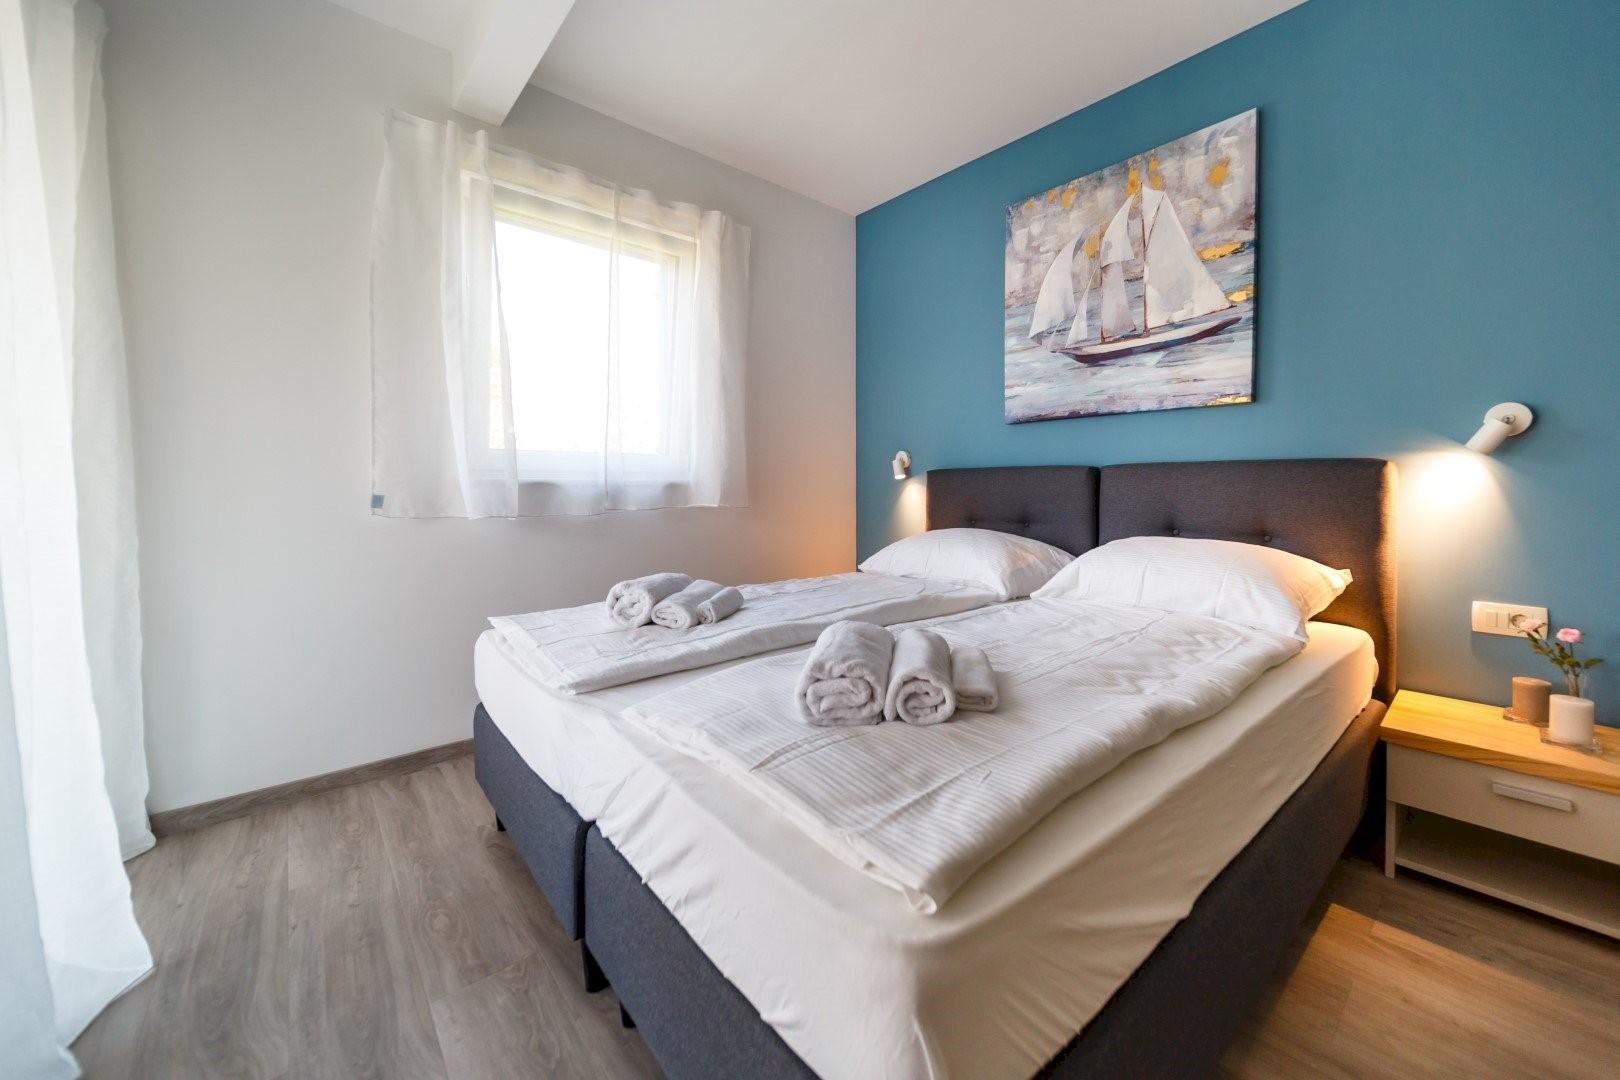 Ferienhaus Luxury Villa Loma 2 (2586643), Sveti Vid-Miholjice, Insel Krk, Kvarner, Kroatien, Bild 20